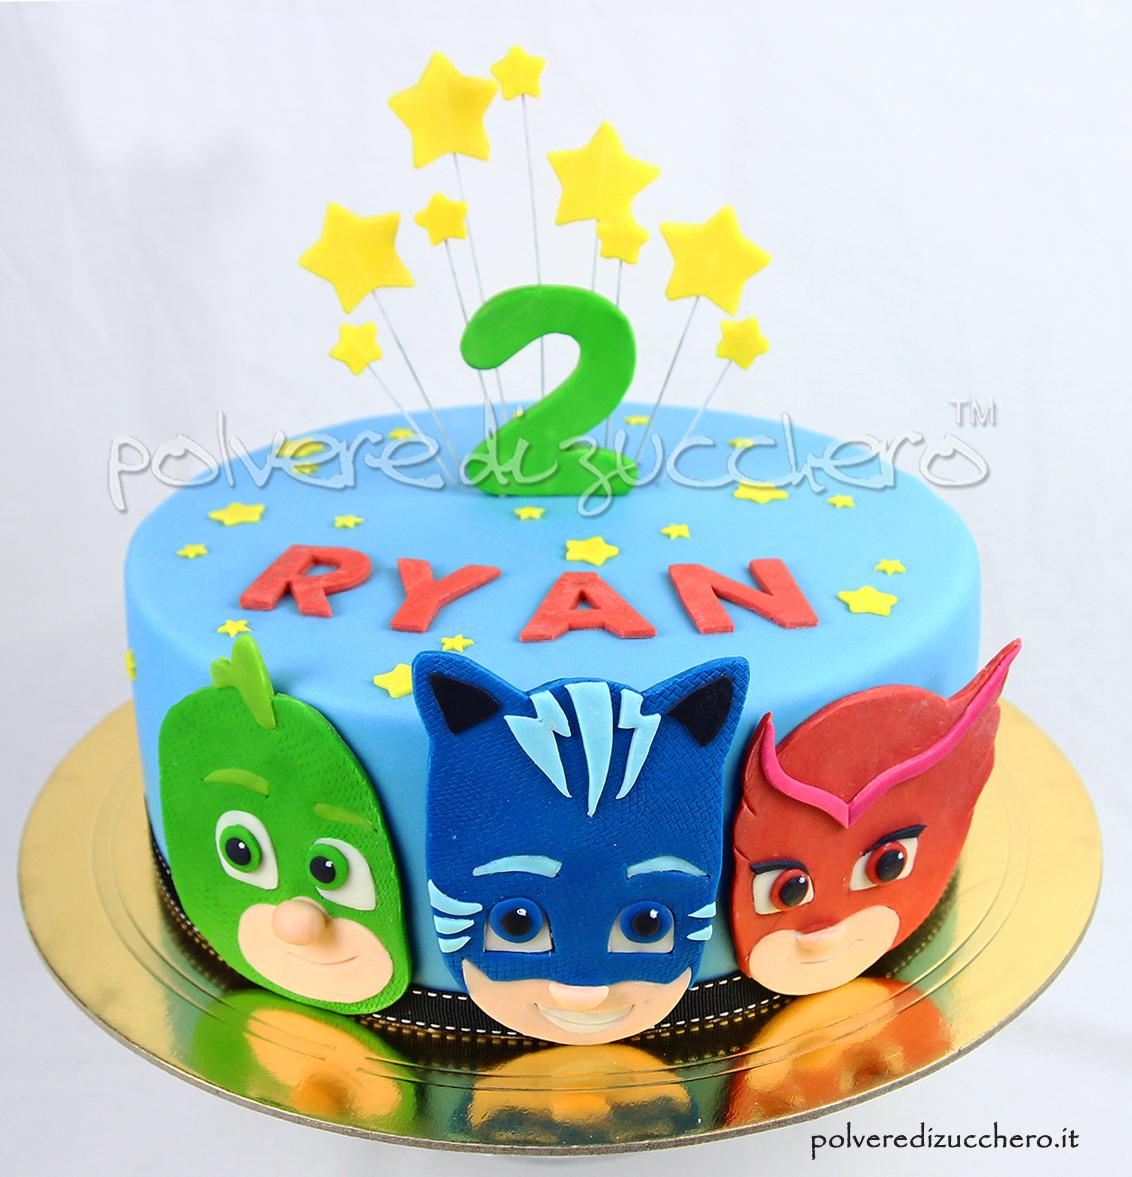 pj masks super pigiamini maschere cake design pasta di zucchero polvere di zucchero torta decorata bambini